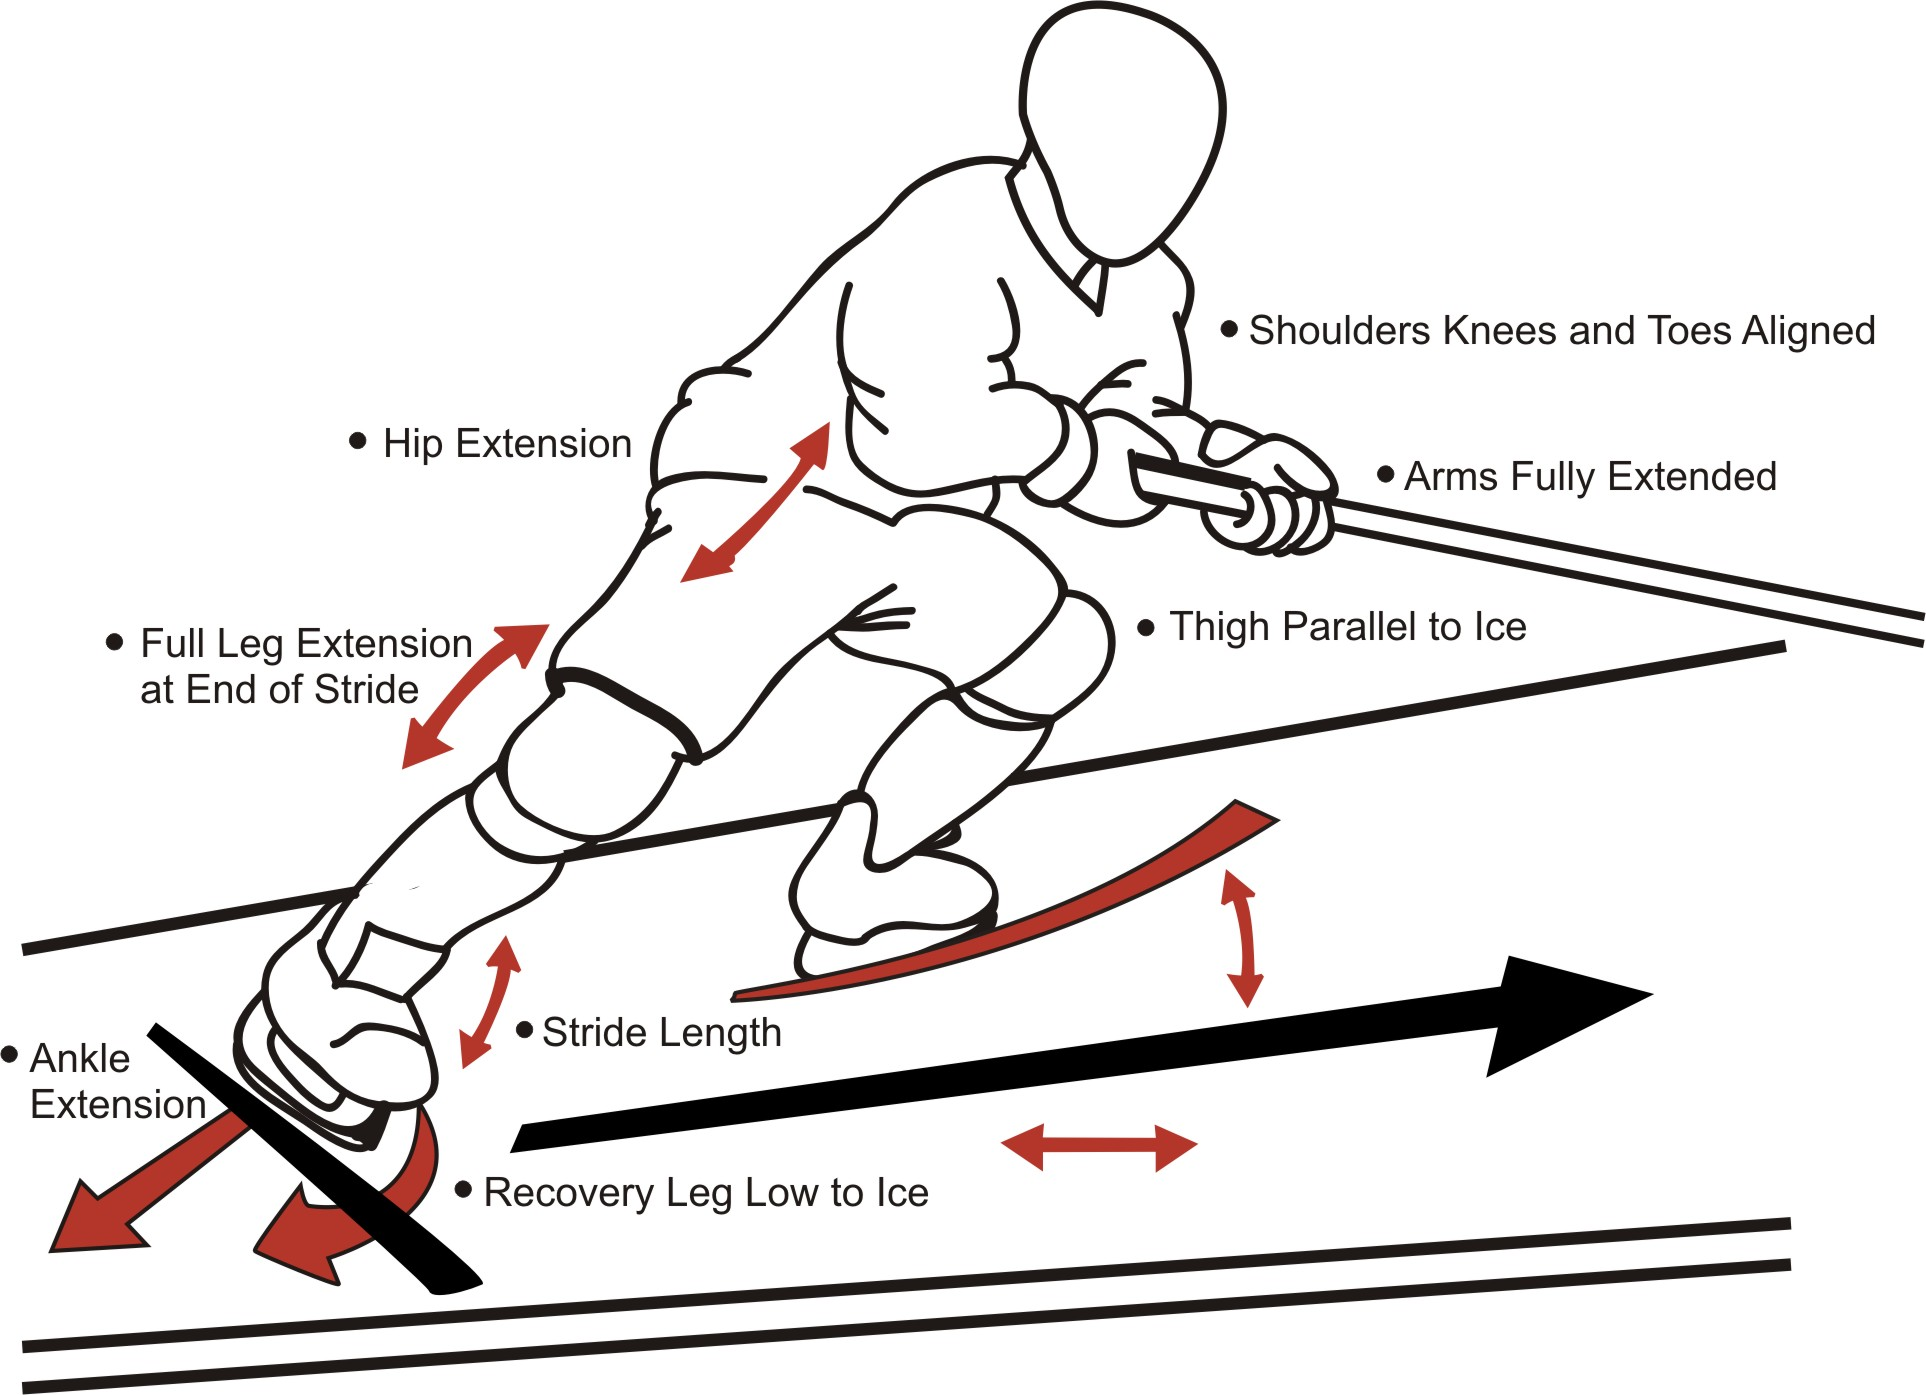 hockey player diagram hunter ceiling power skating development etobicoke dolphins